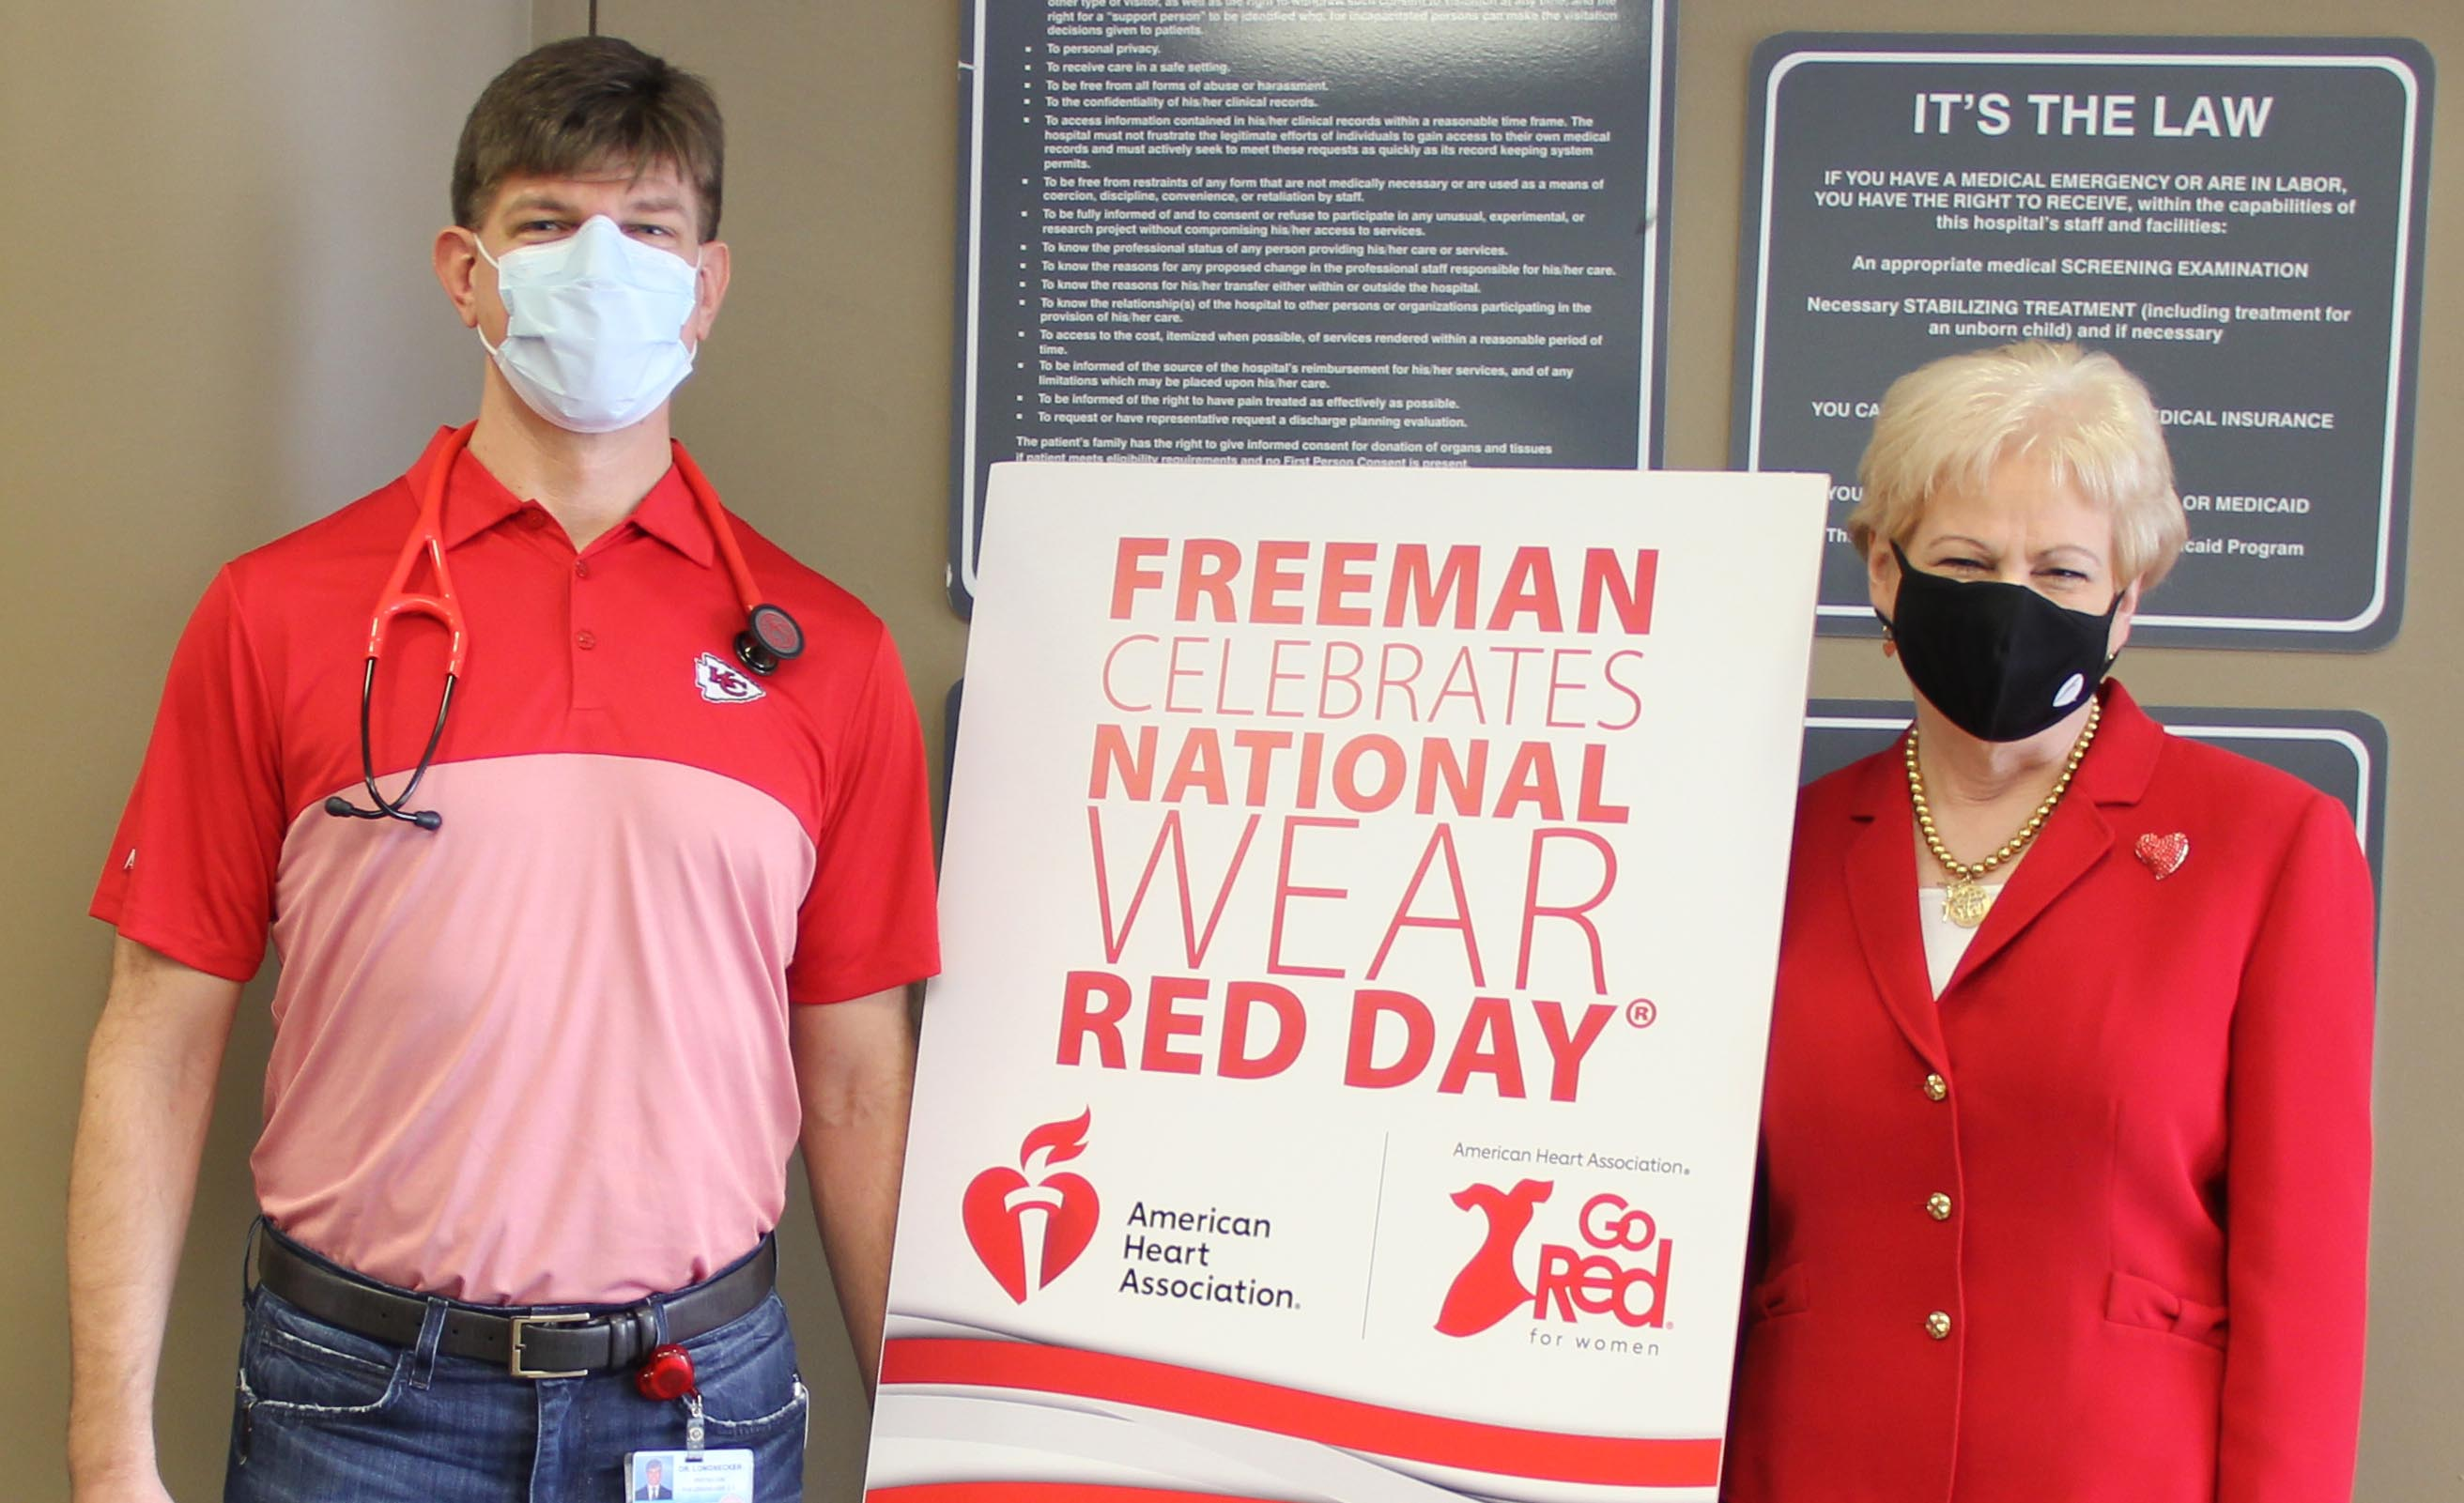 Freeman goes red 2021